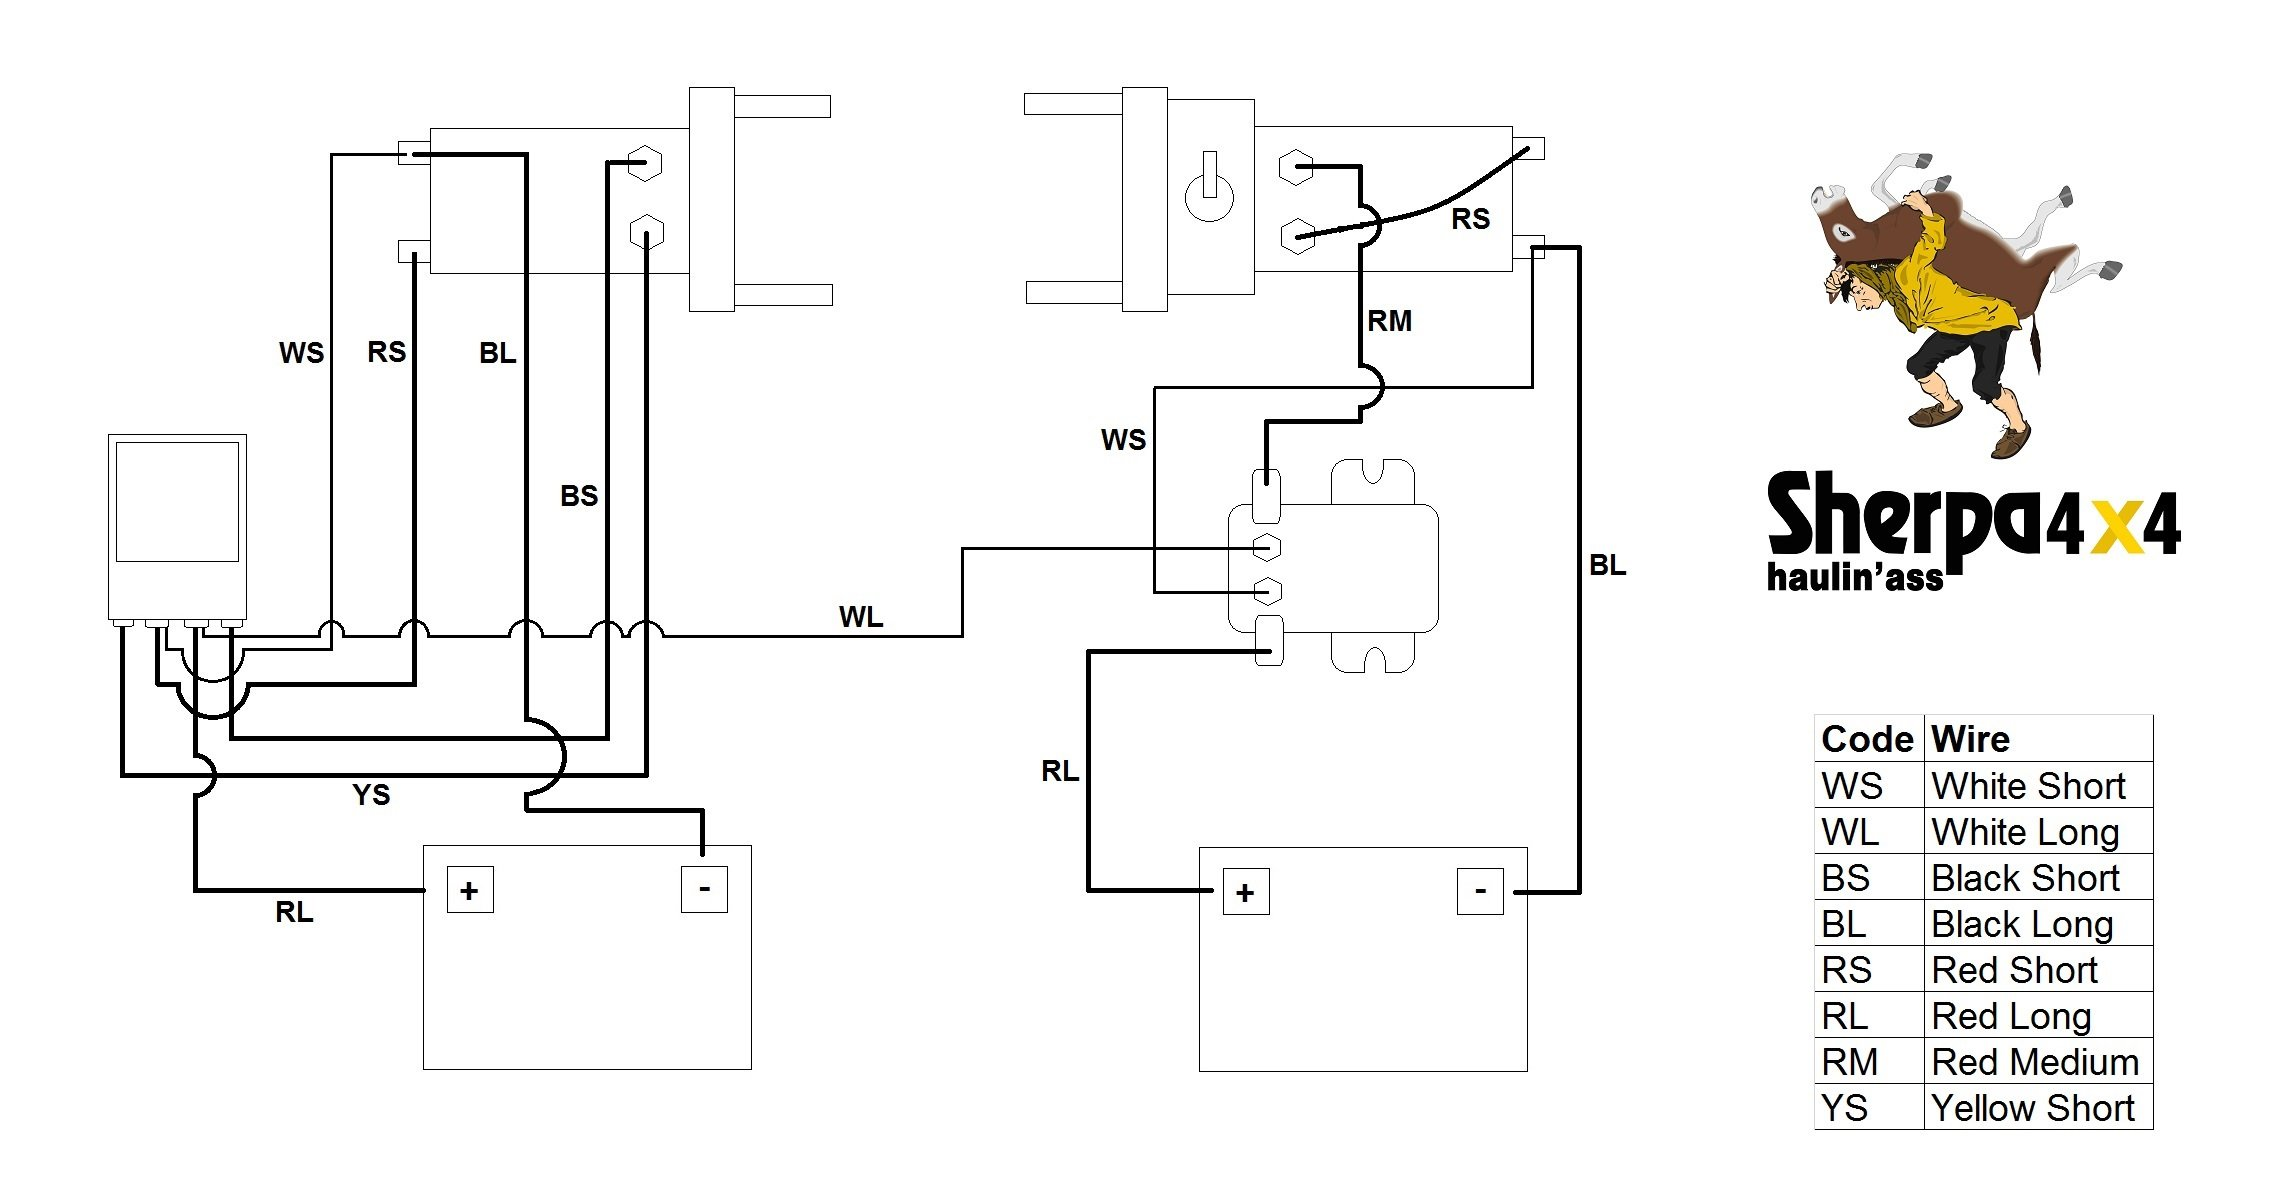 Groovy Mictuning Winch 7 Pin Wiring Diagram Warn Winch A Wiring Diagram Wiring Cloud Timewinrebemohammedshrineorg